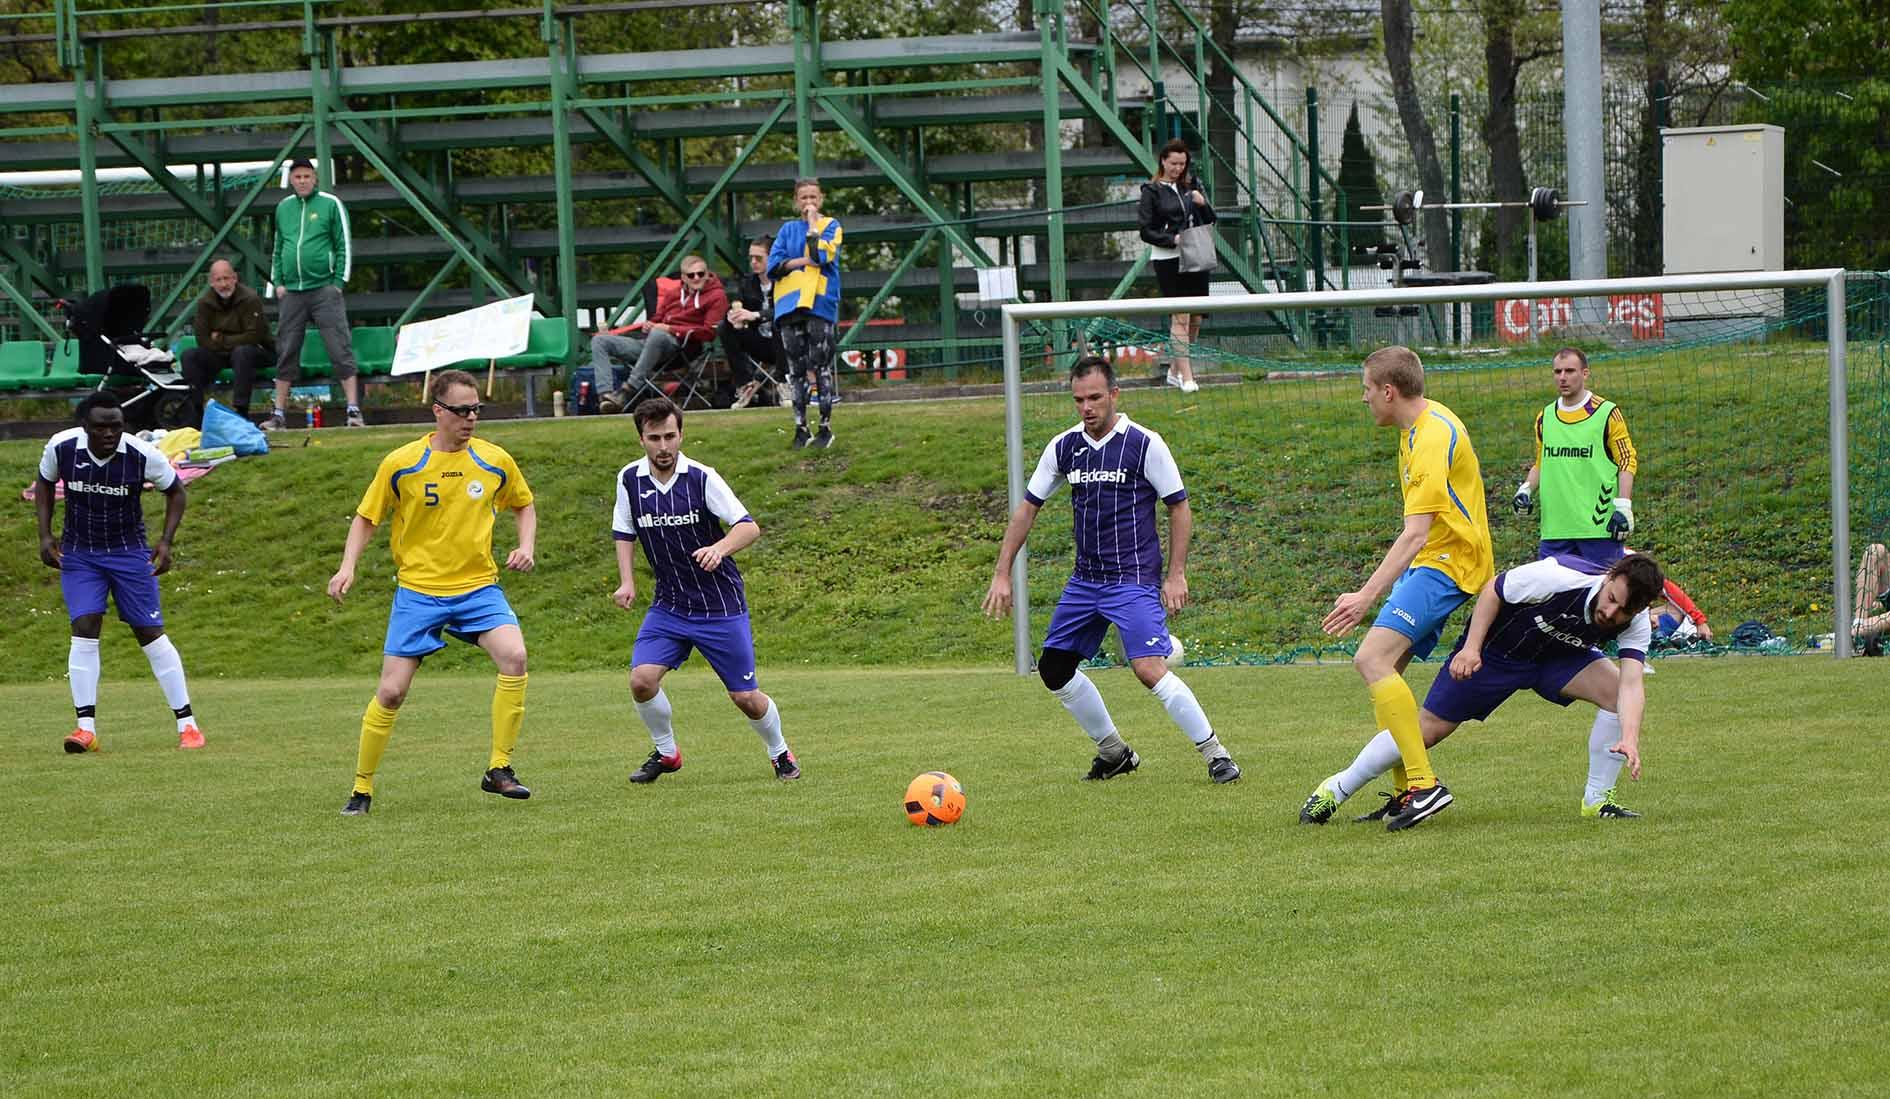 2017.05.27 Football tournament (7)